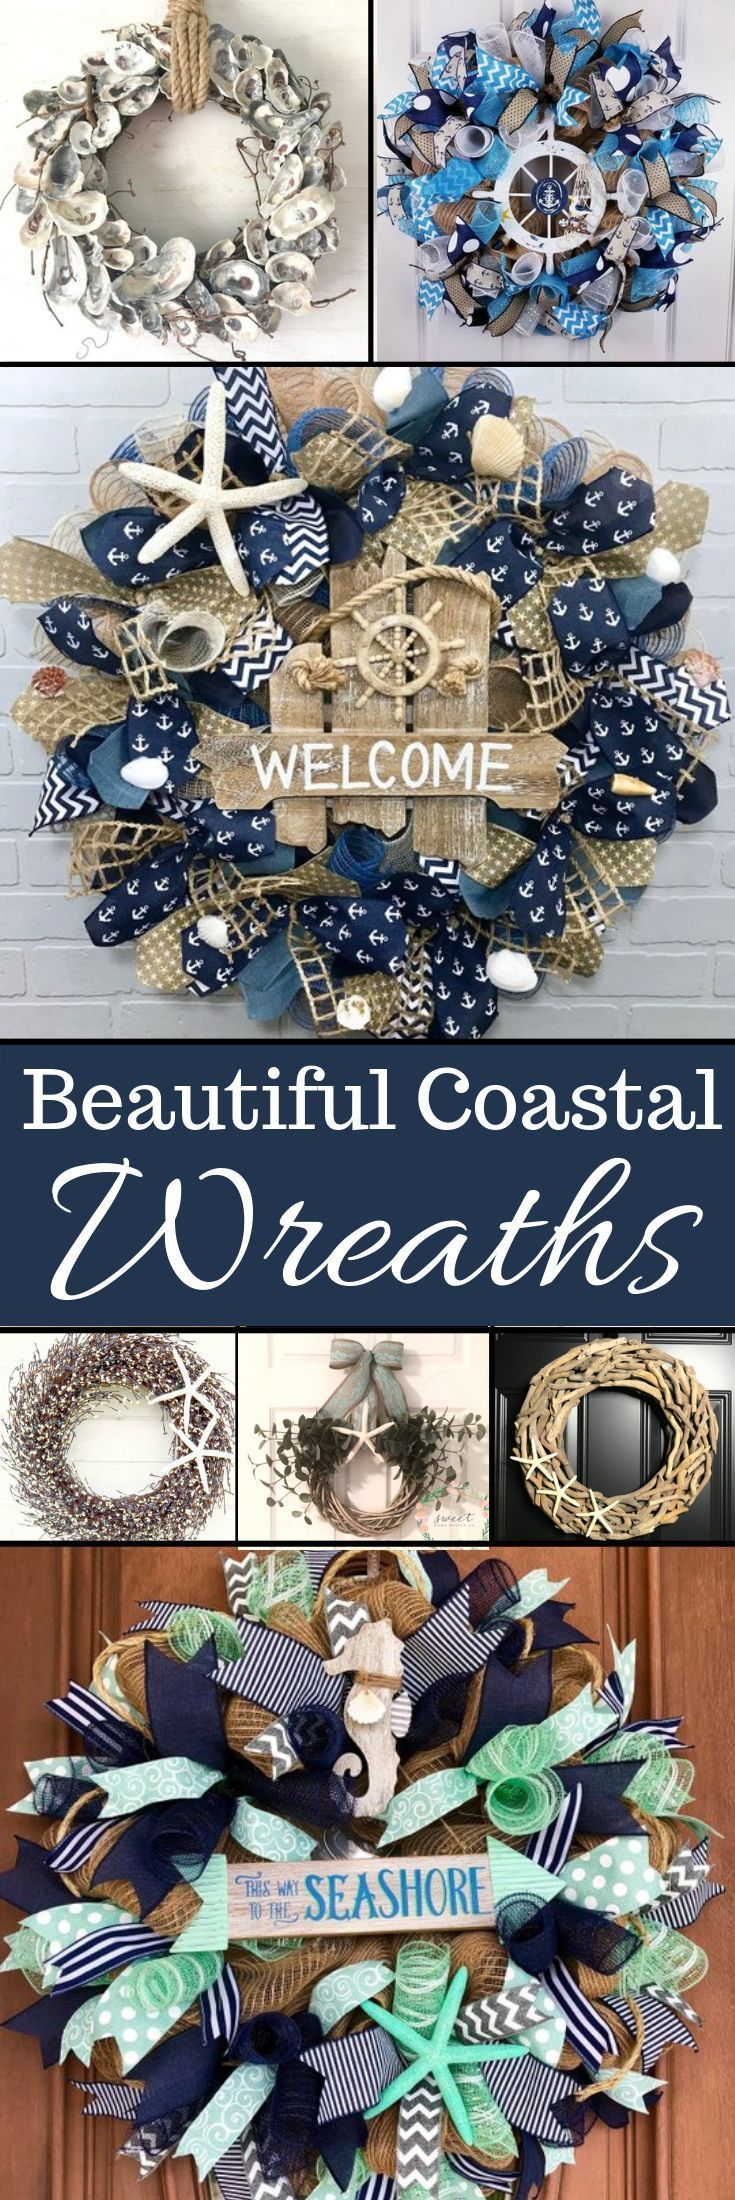 Photo of Coastal Wreaths for my Beach House Front Door – My Cozy Colorado